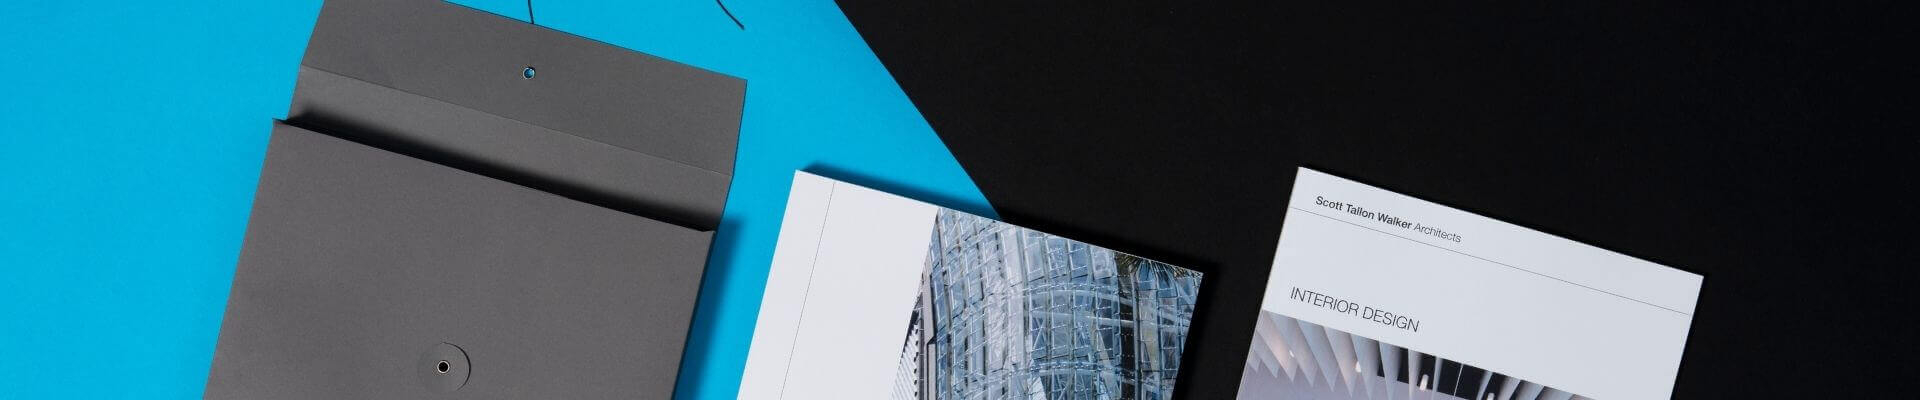 Personalisation - Bespoke - Envelopes - Handmade Envelopes